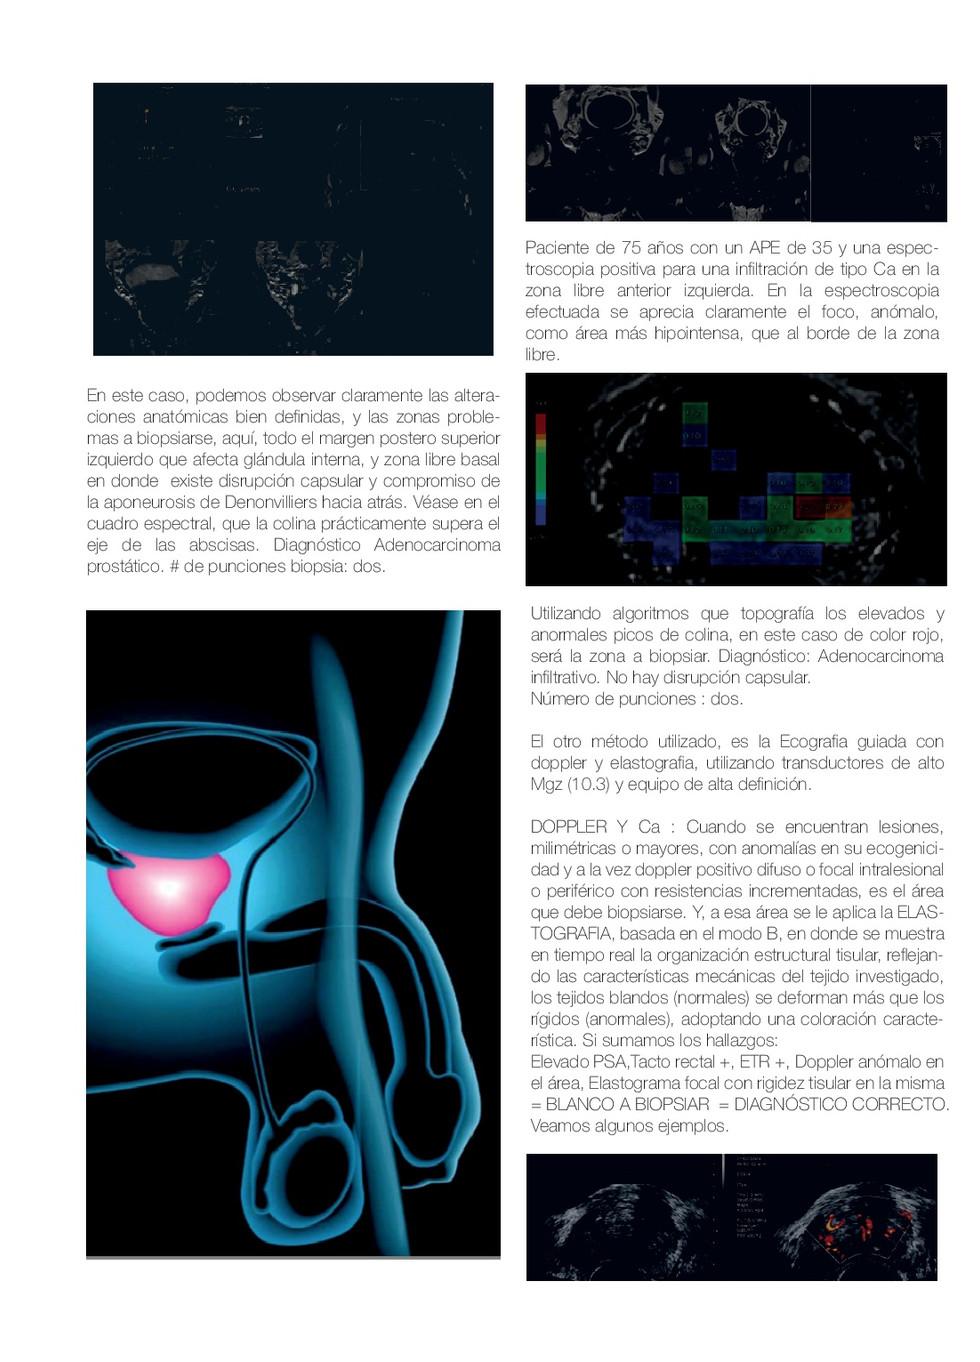 BIOPSIA-PROSTATICA-(1)-002.jpg